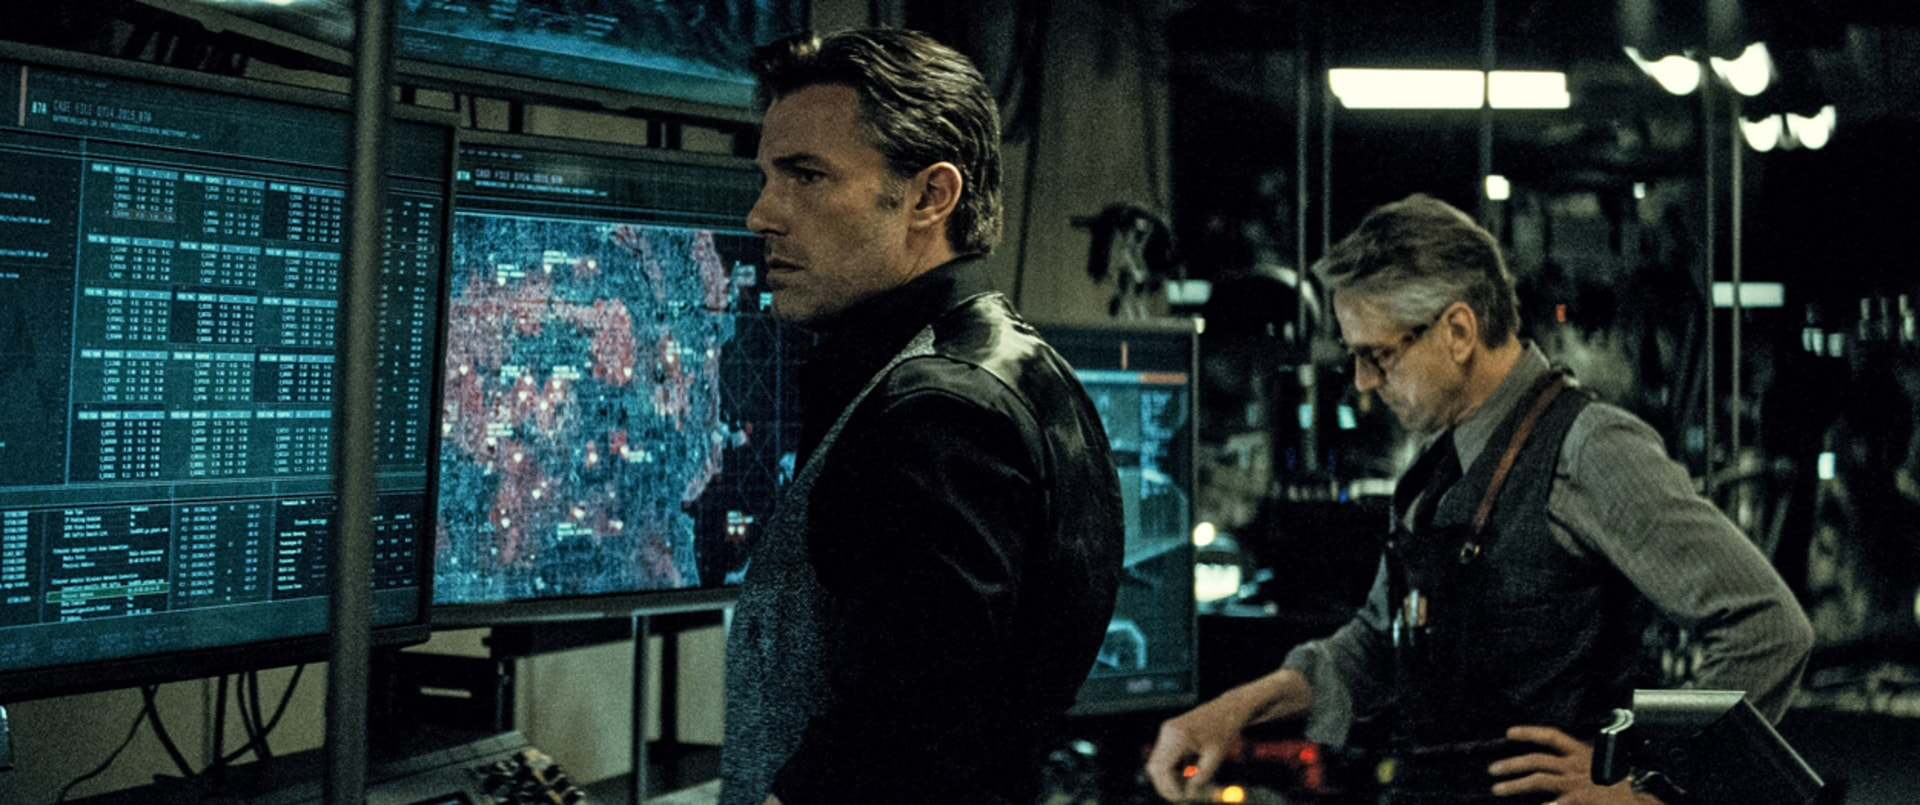 BEN AFFLECK as Bruce Wayne / Batman and JEREMY IRONS as Alfred